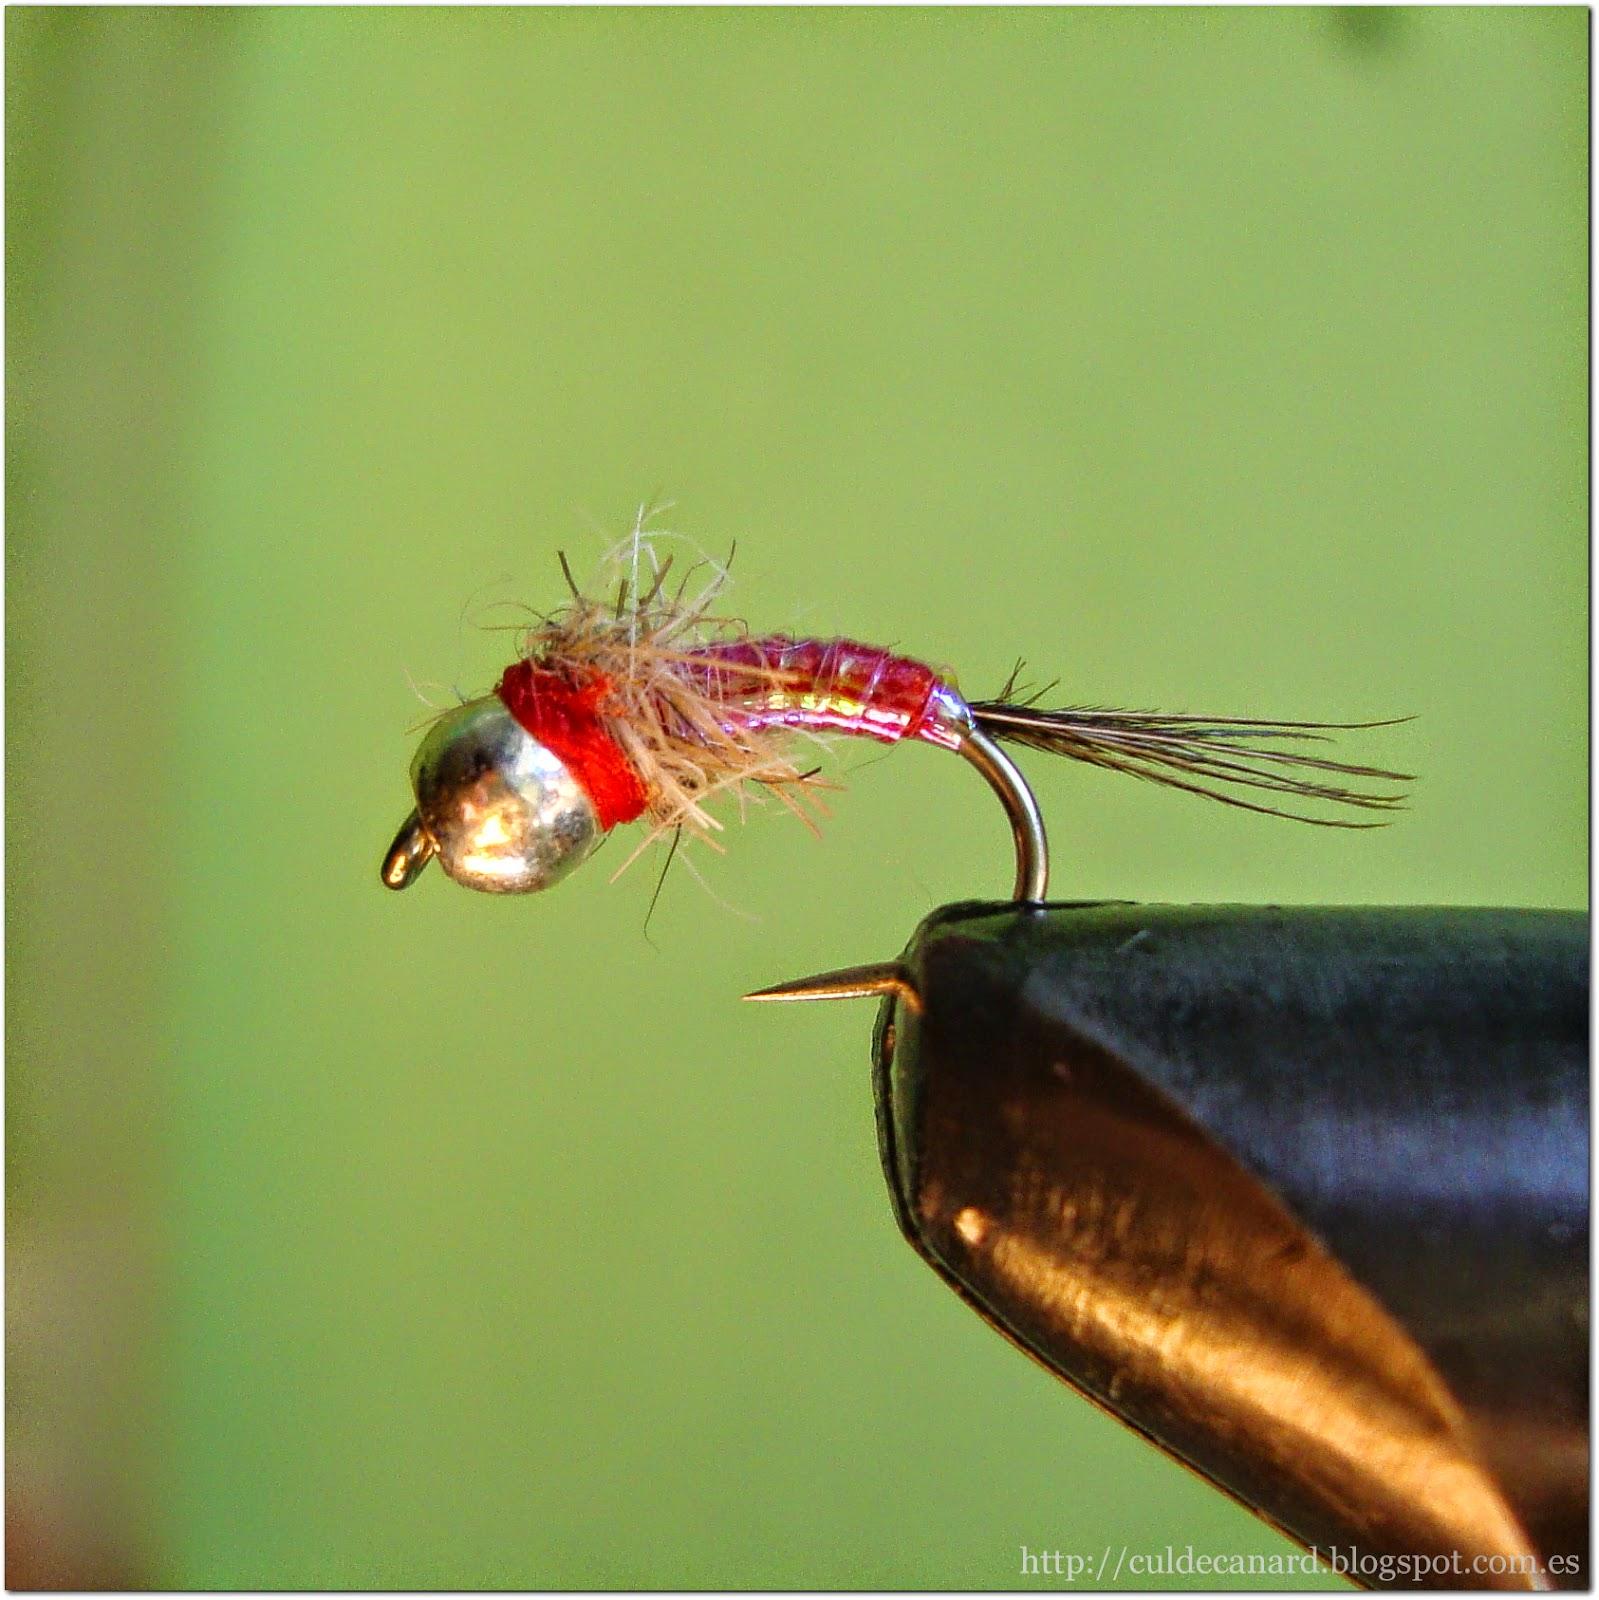 Rainbow Warrior Midge: Fly Fishing Blog: Ninfas Atractoras